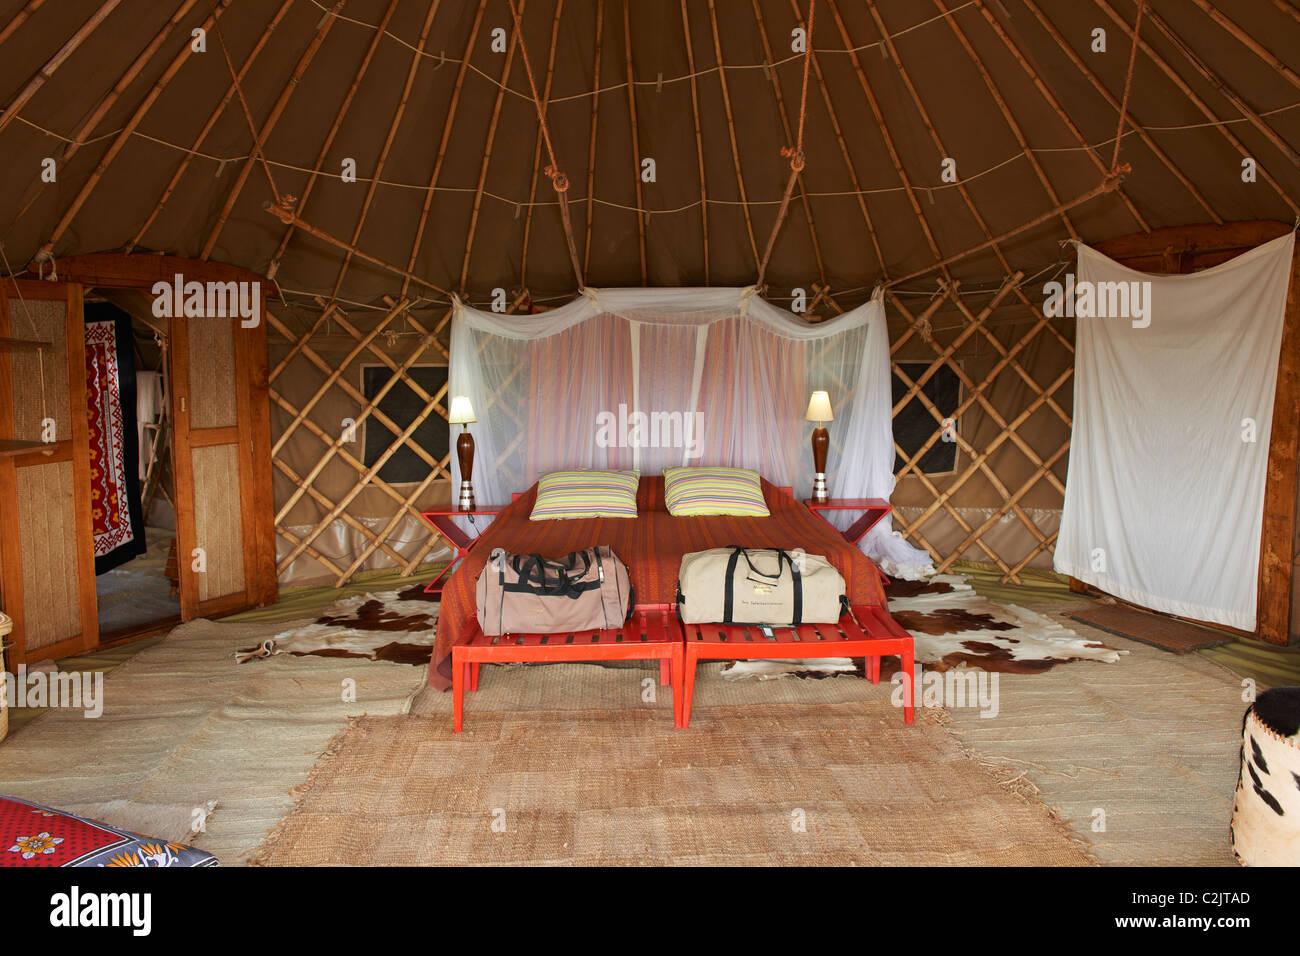 interior shot of  luxury sleeping room in tent of Nduara Loliondo Tended Safari Camp, Serengeti, Tanzania, Africa - Stock Image